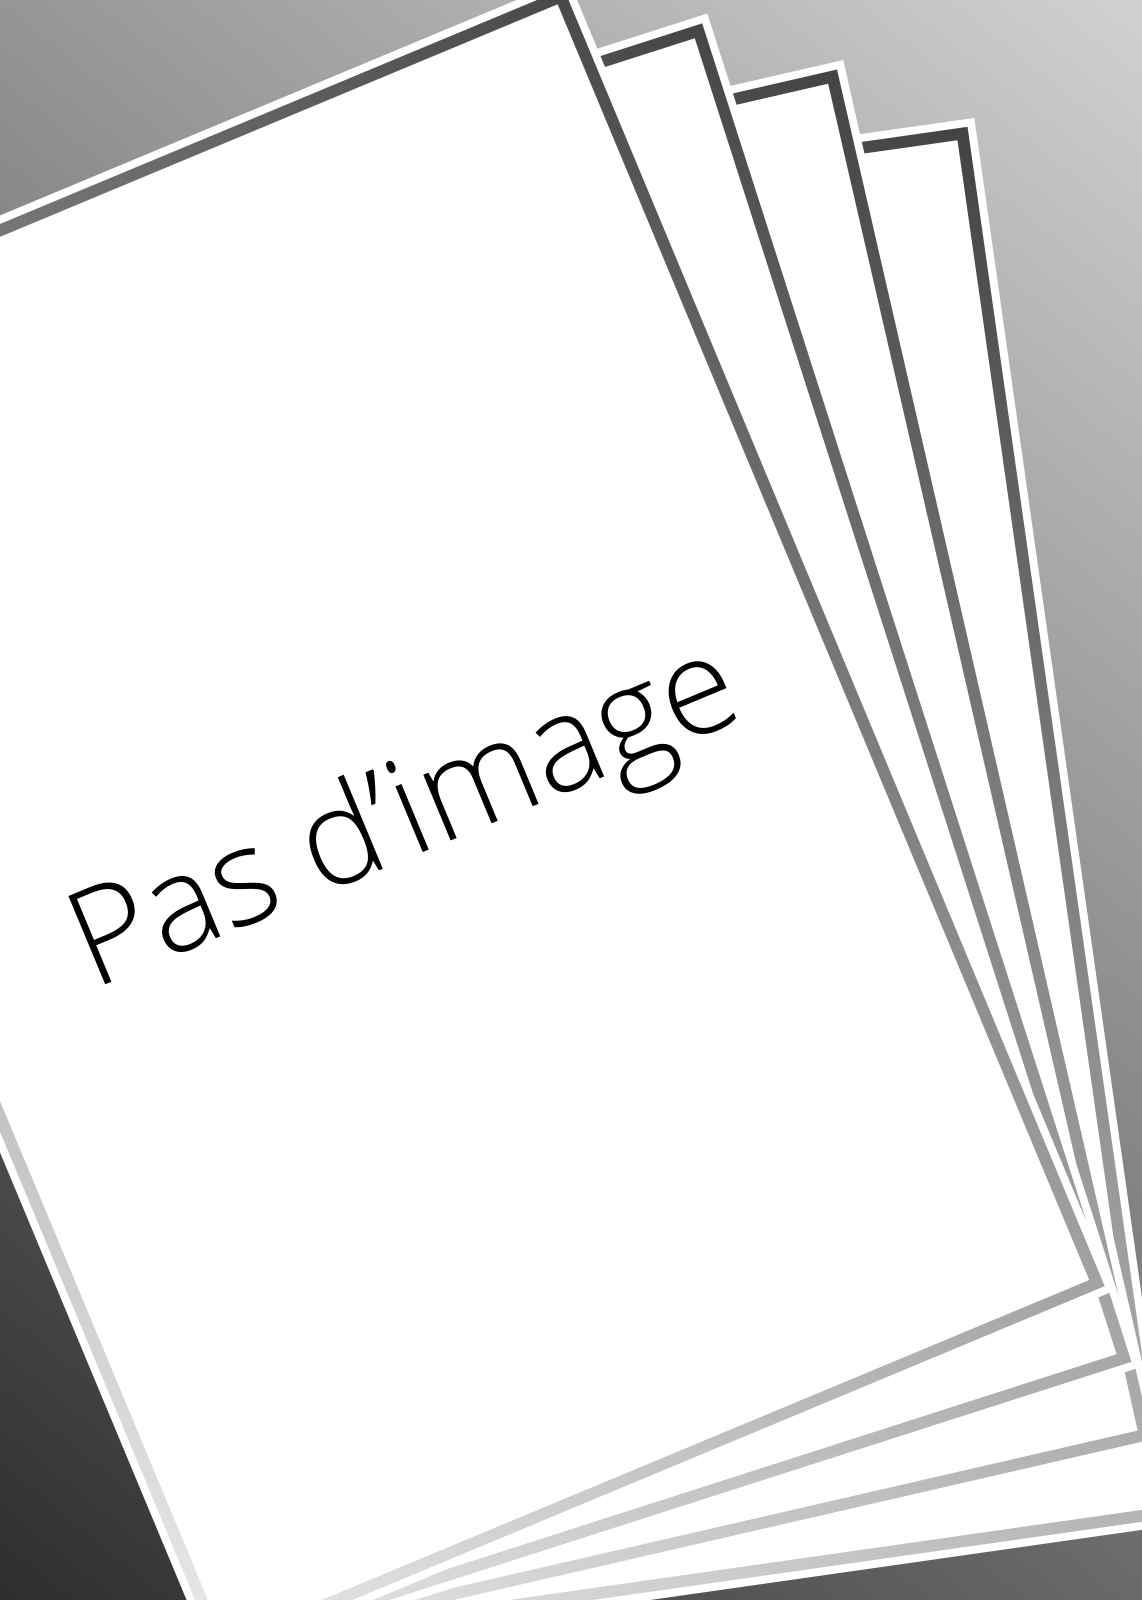 Eyrolles - Present cahie design 40ex cahiers du designer 40 volumes au total